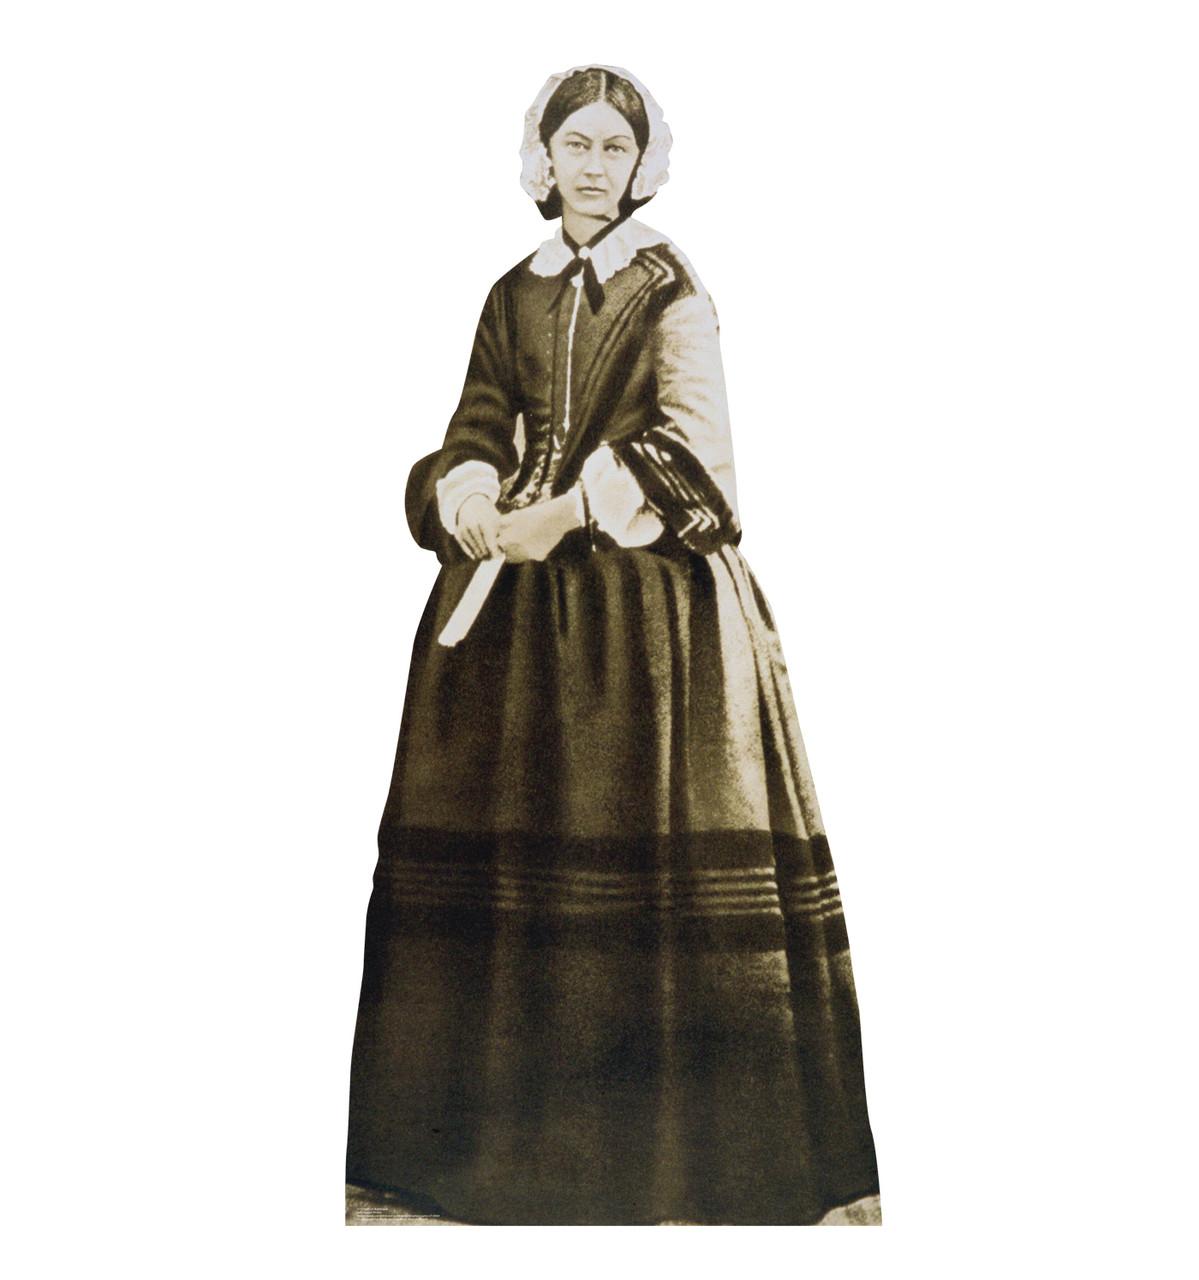 Life-size cardboard standee of Florence Nightingale.